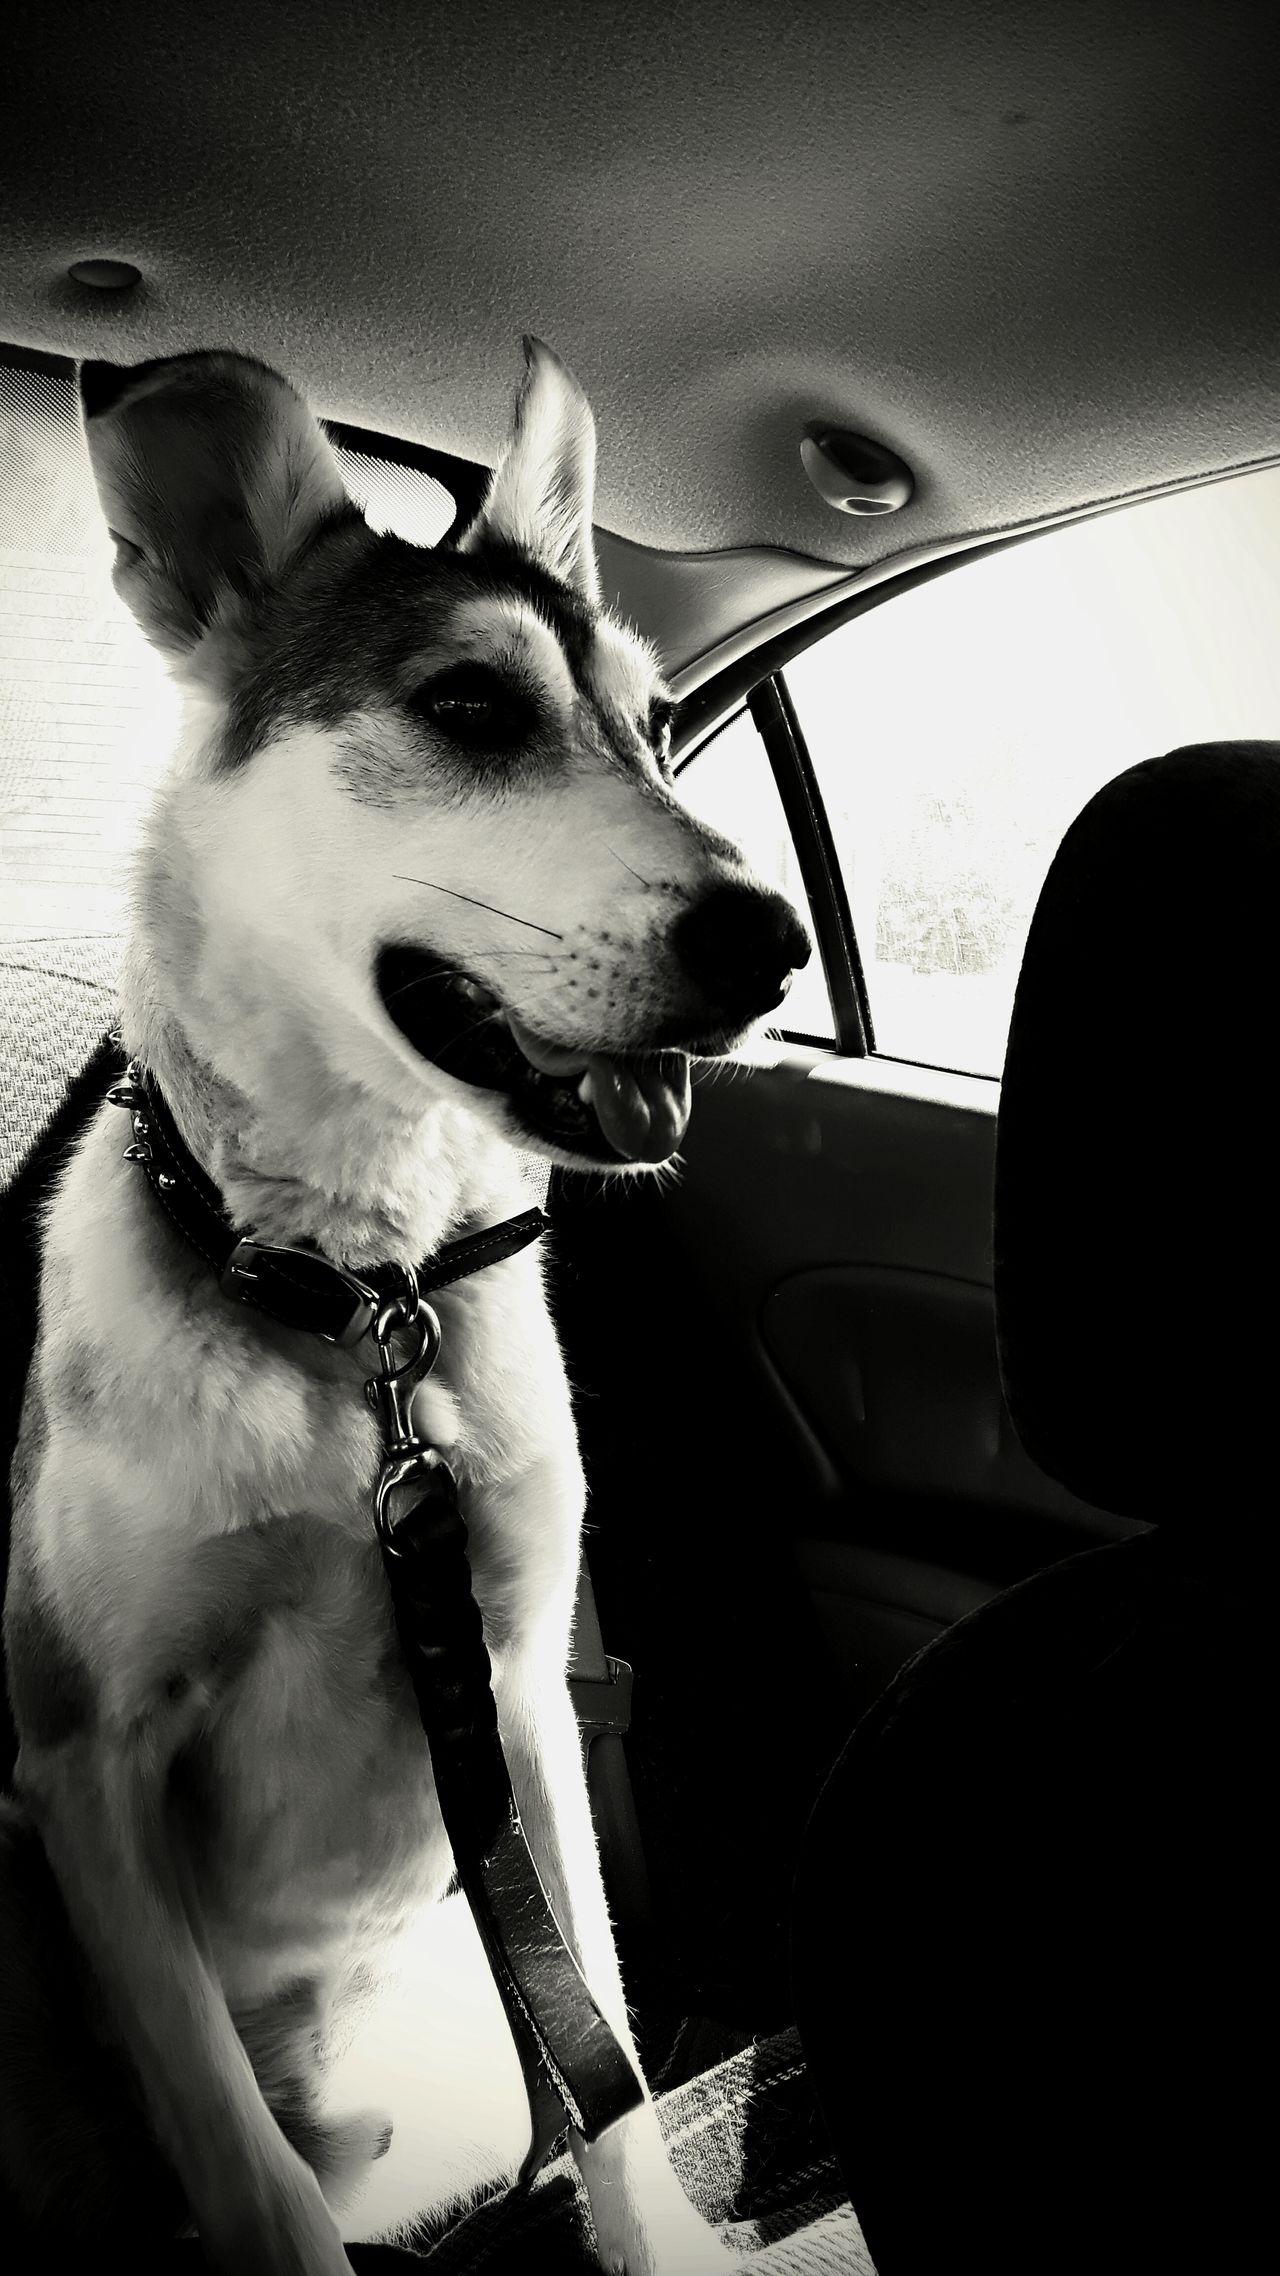 Black & White Lovehim Happy Sweety  Sweetheart Innocence Dogslife Doglover Dog Pets CarRides